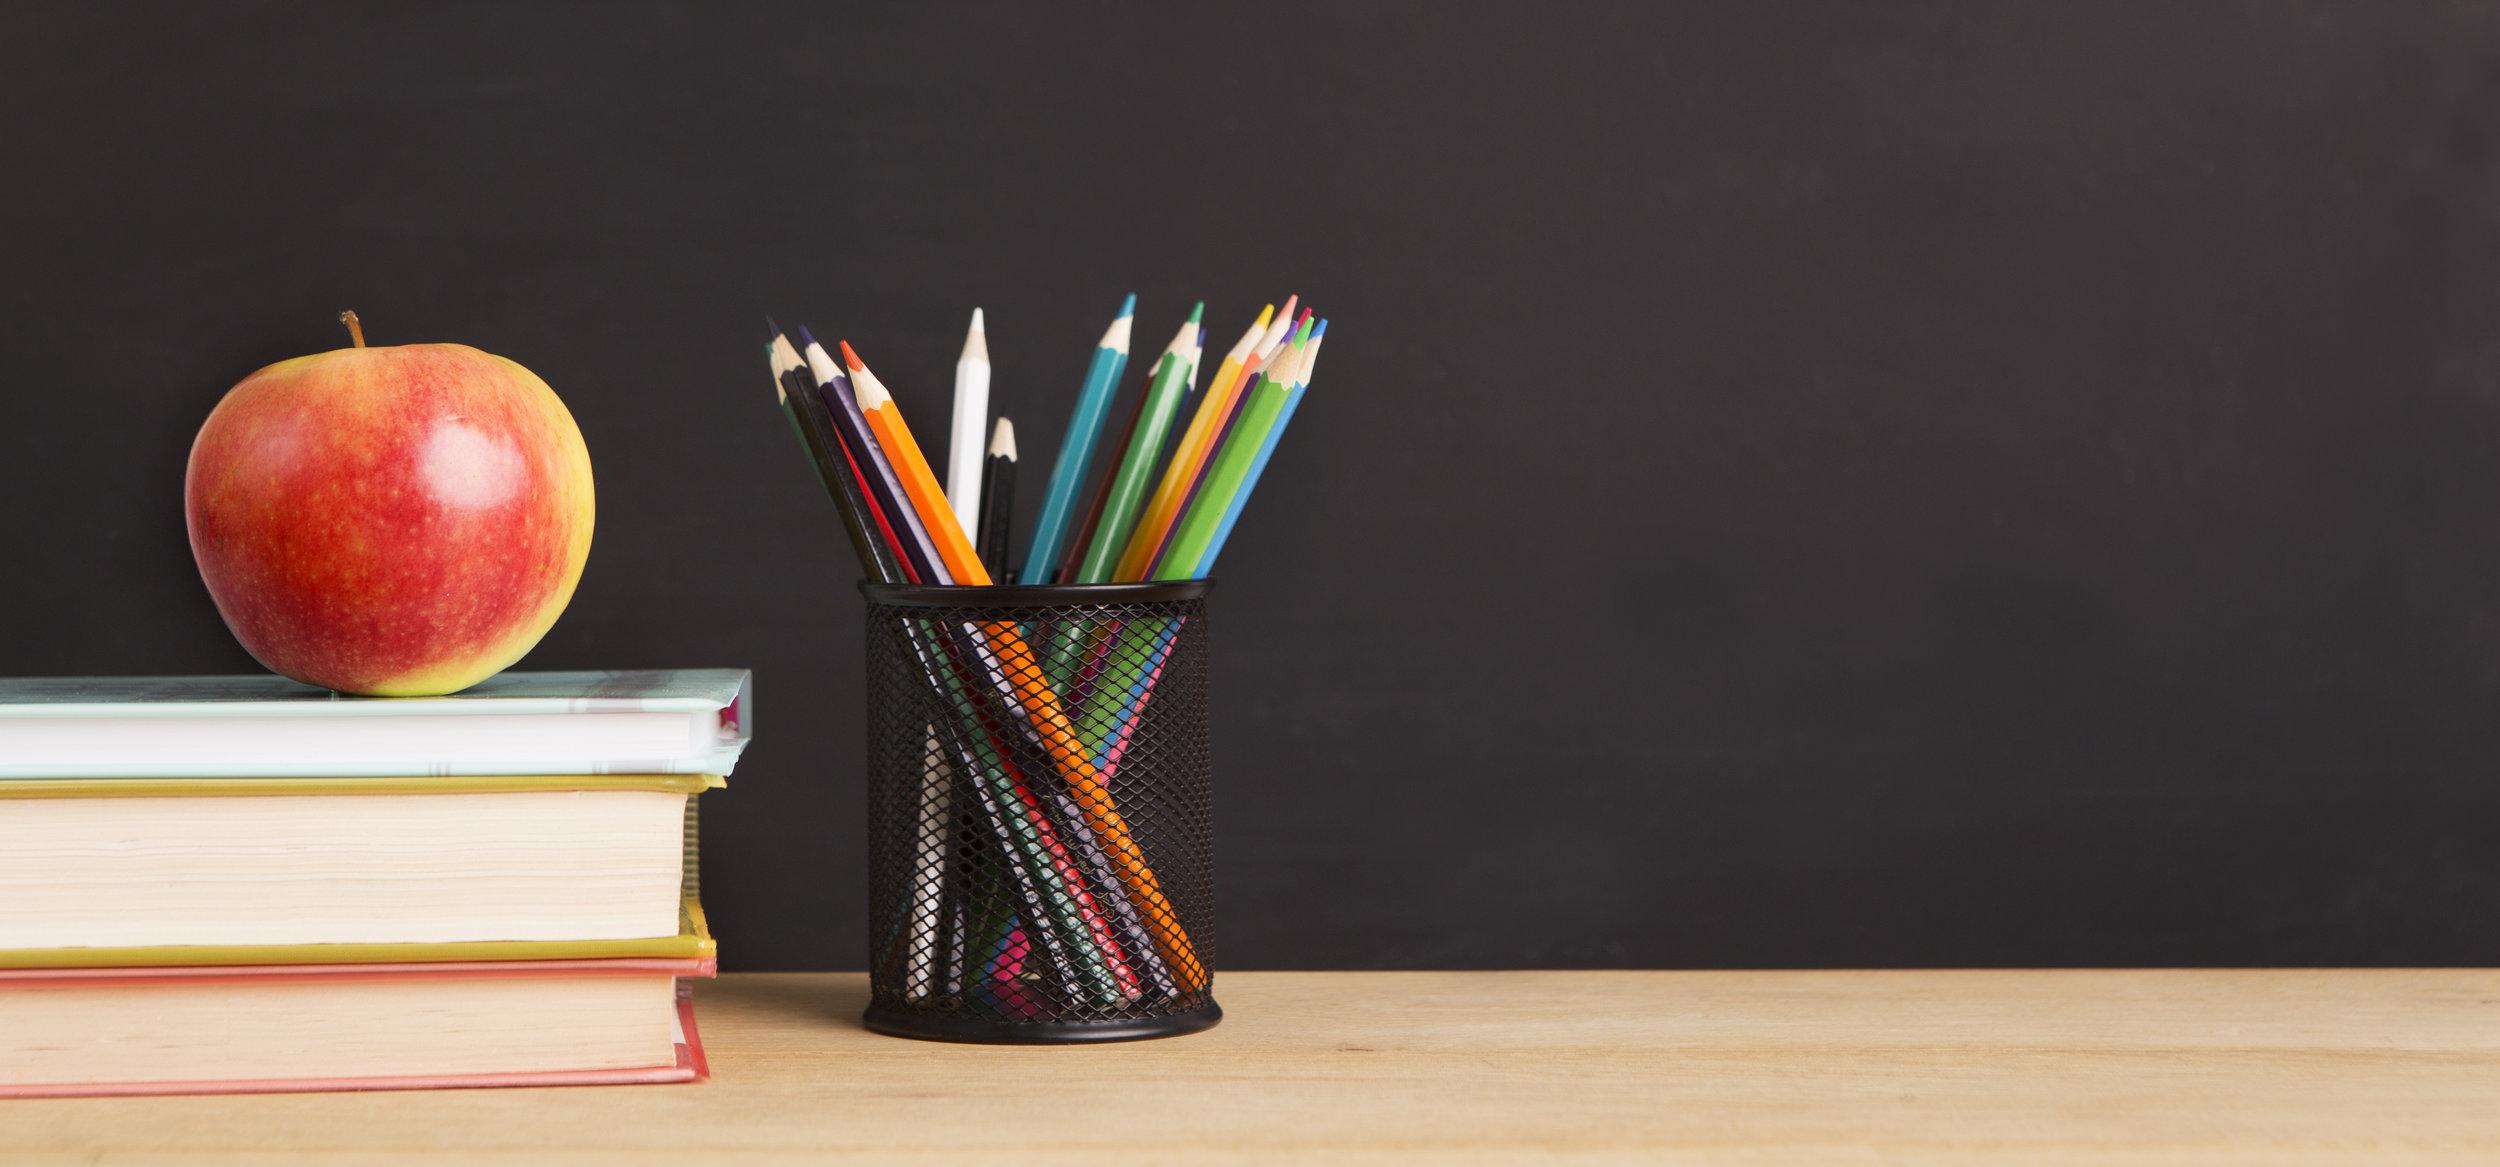 school-books-apple-and-pencils-over-chalkboard-BHWXCMU.jpg